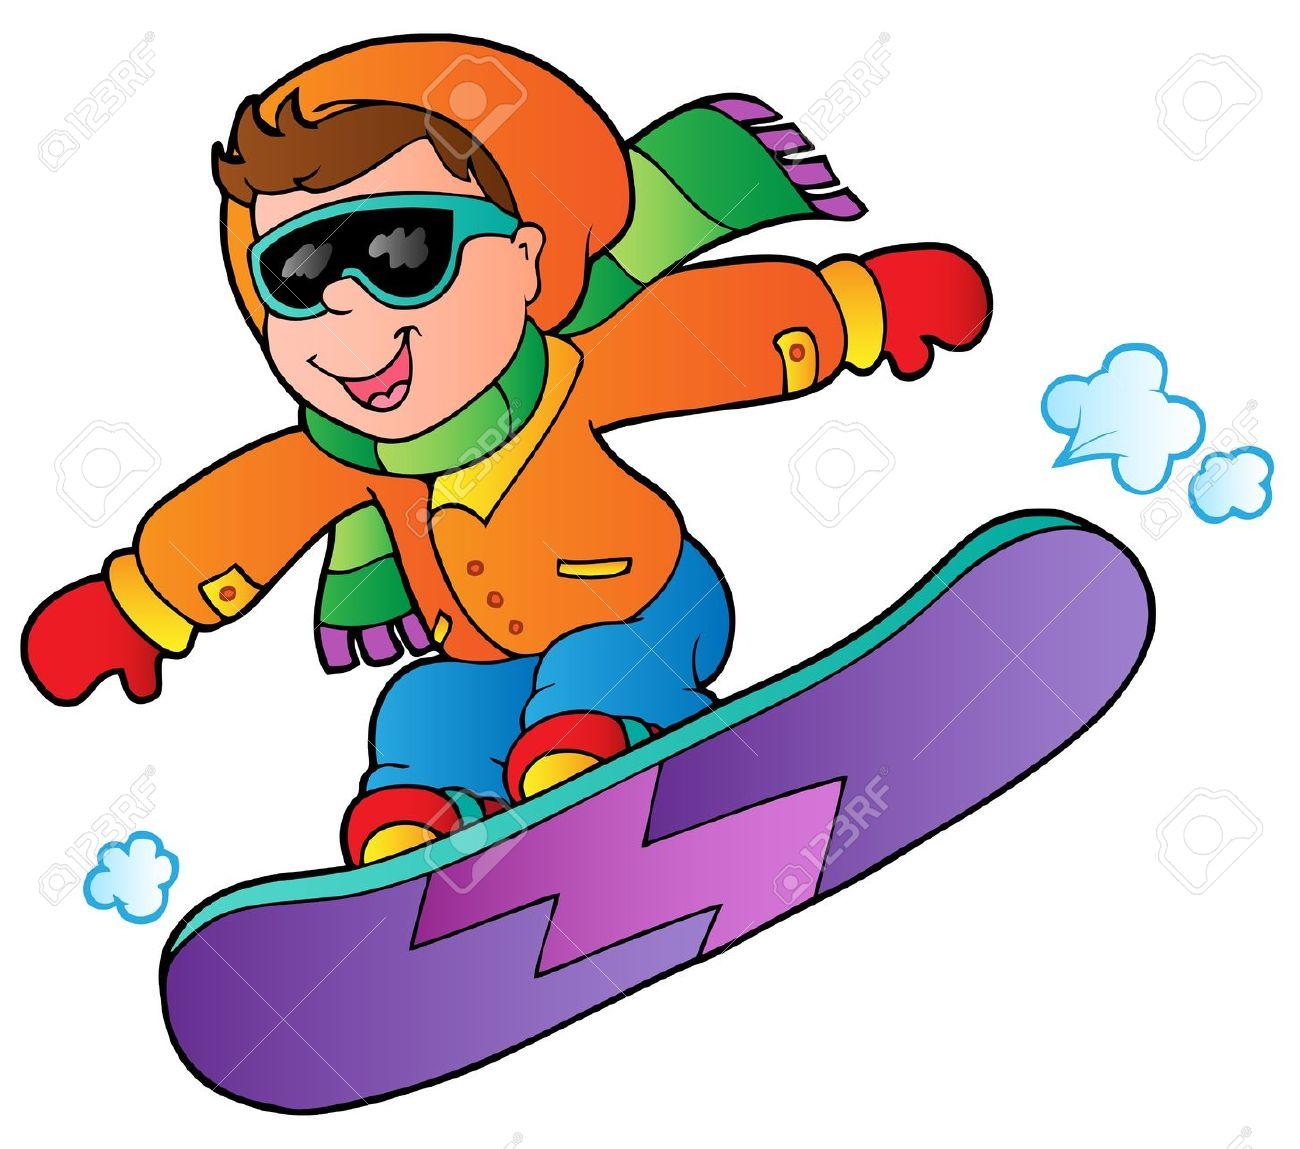 Clip art of snowboarding